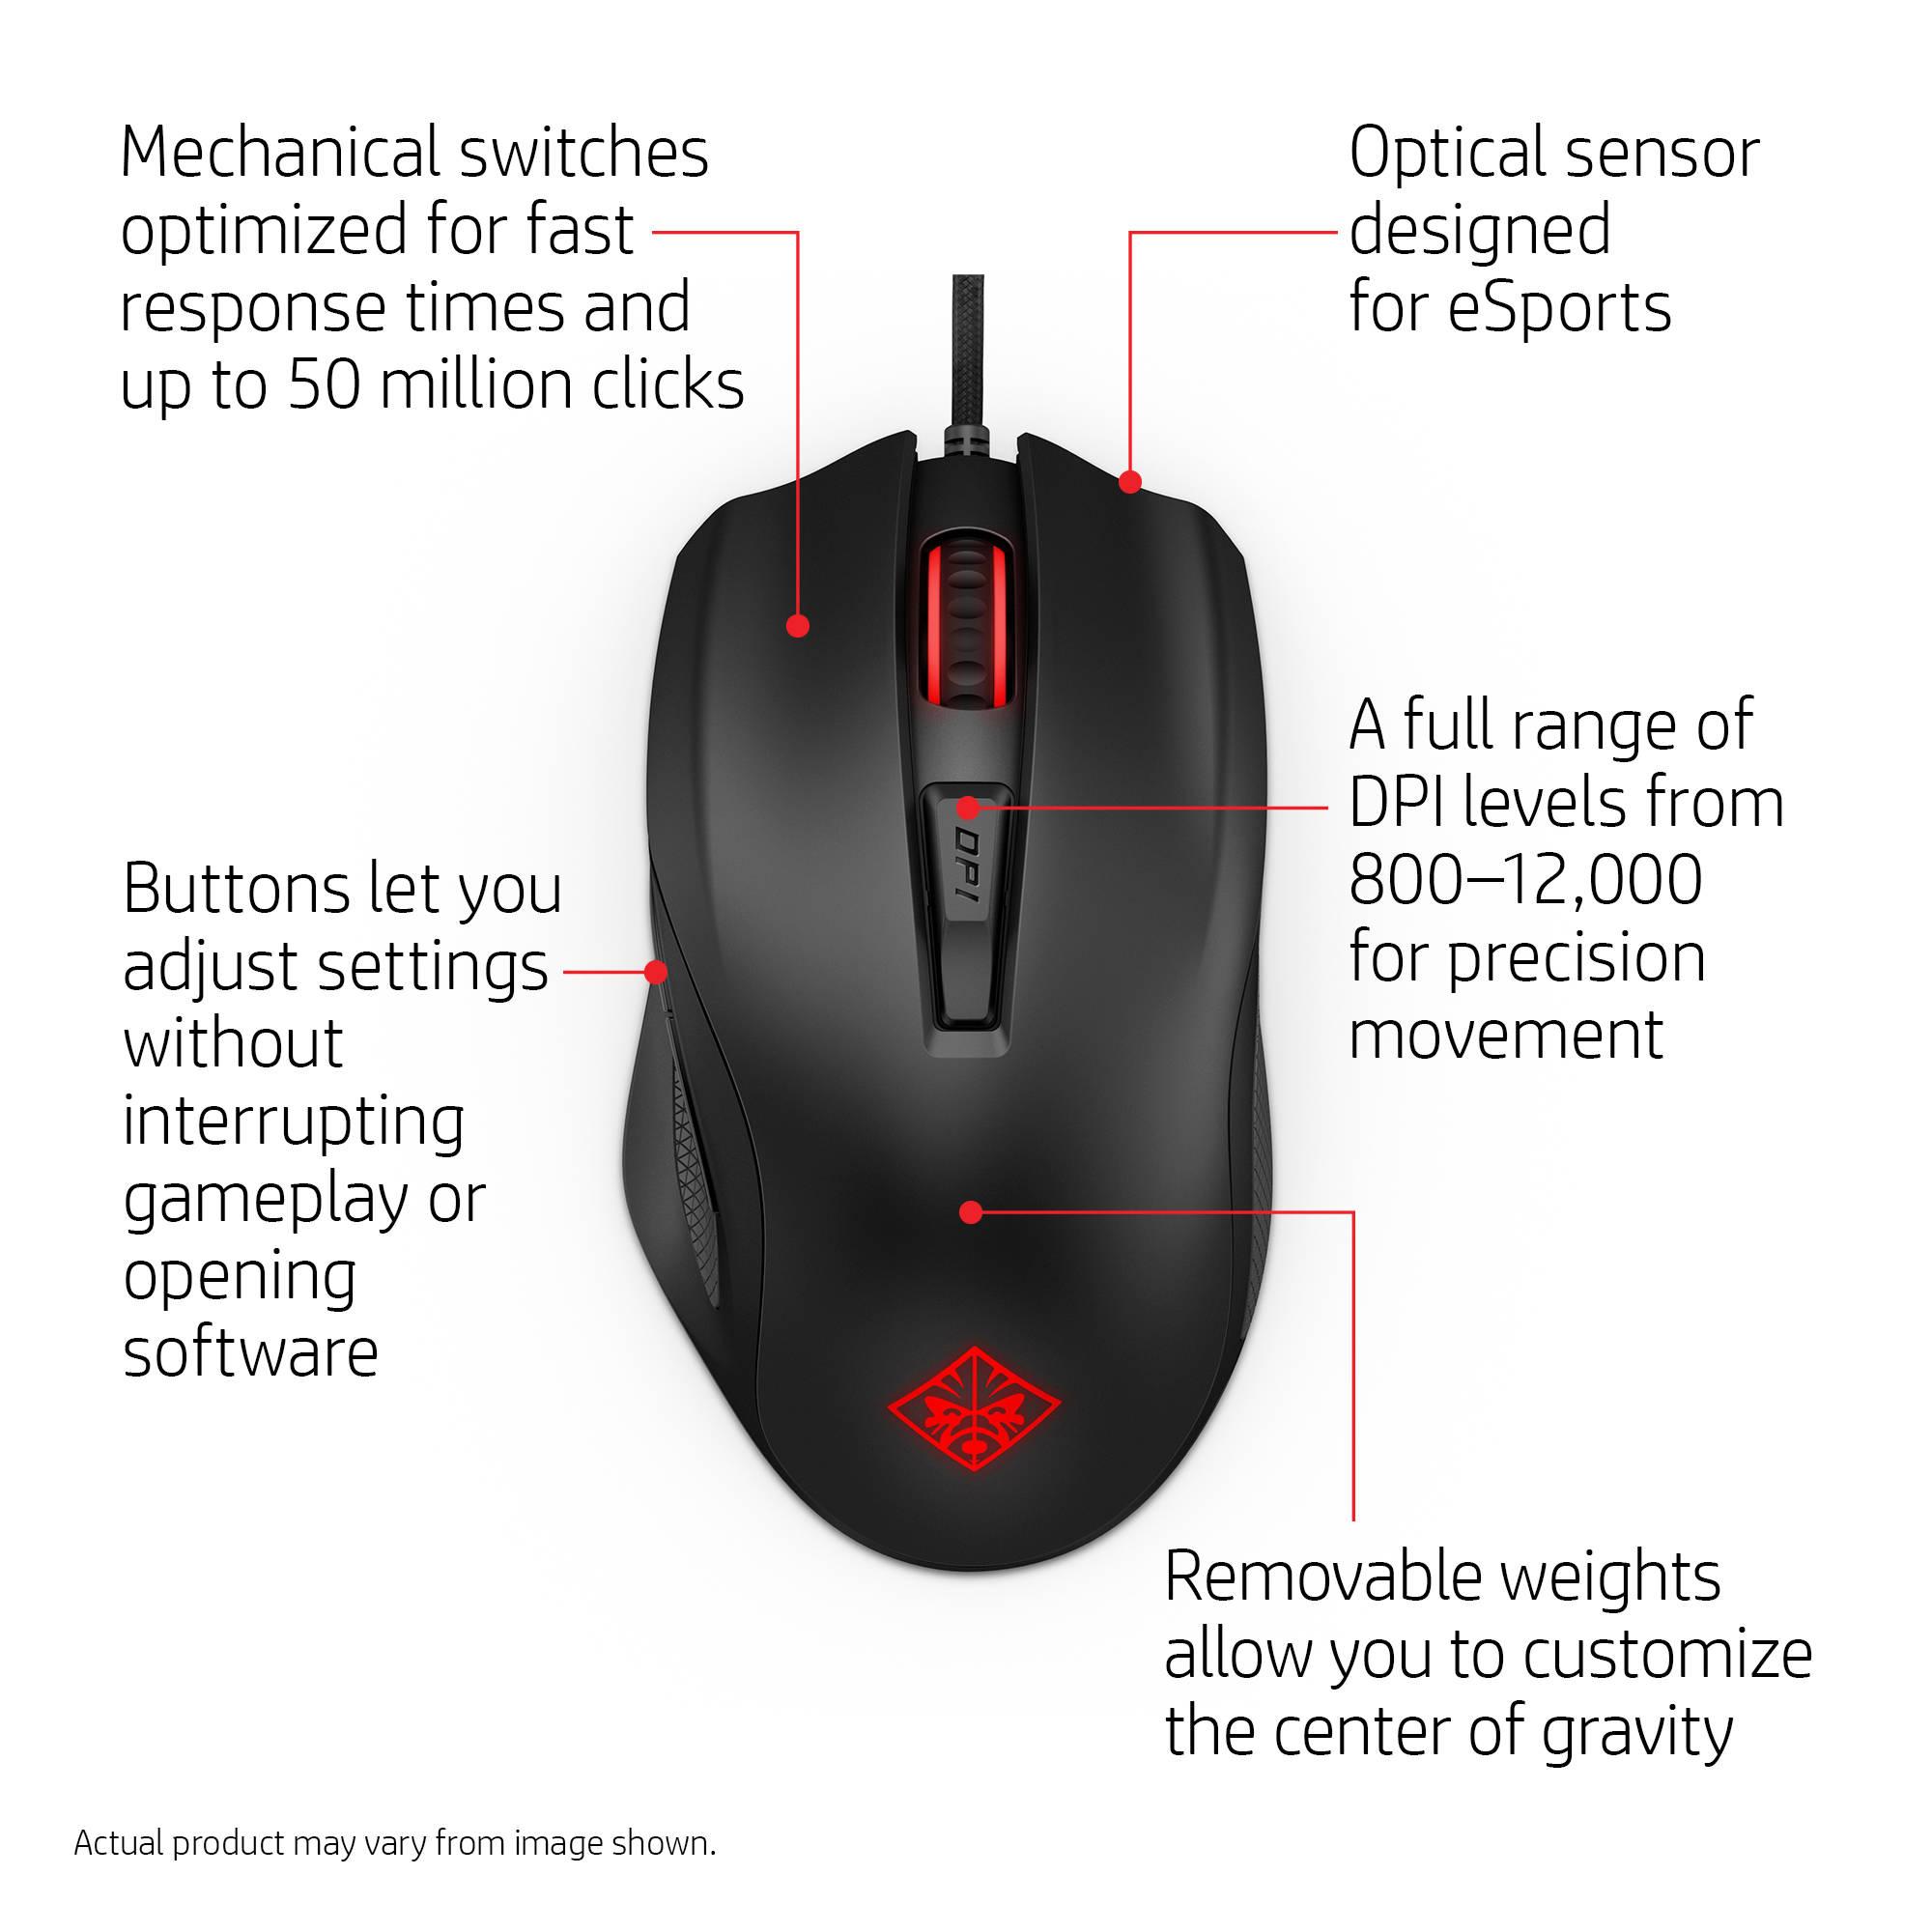 OMEN Mouse HP 600 Optical Cable USB 12000 dpi Black 1KF75AA#ABL